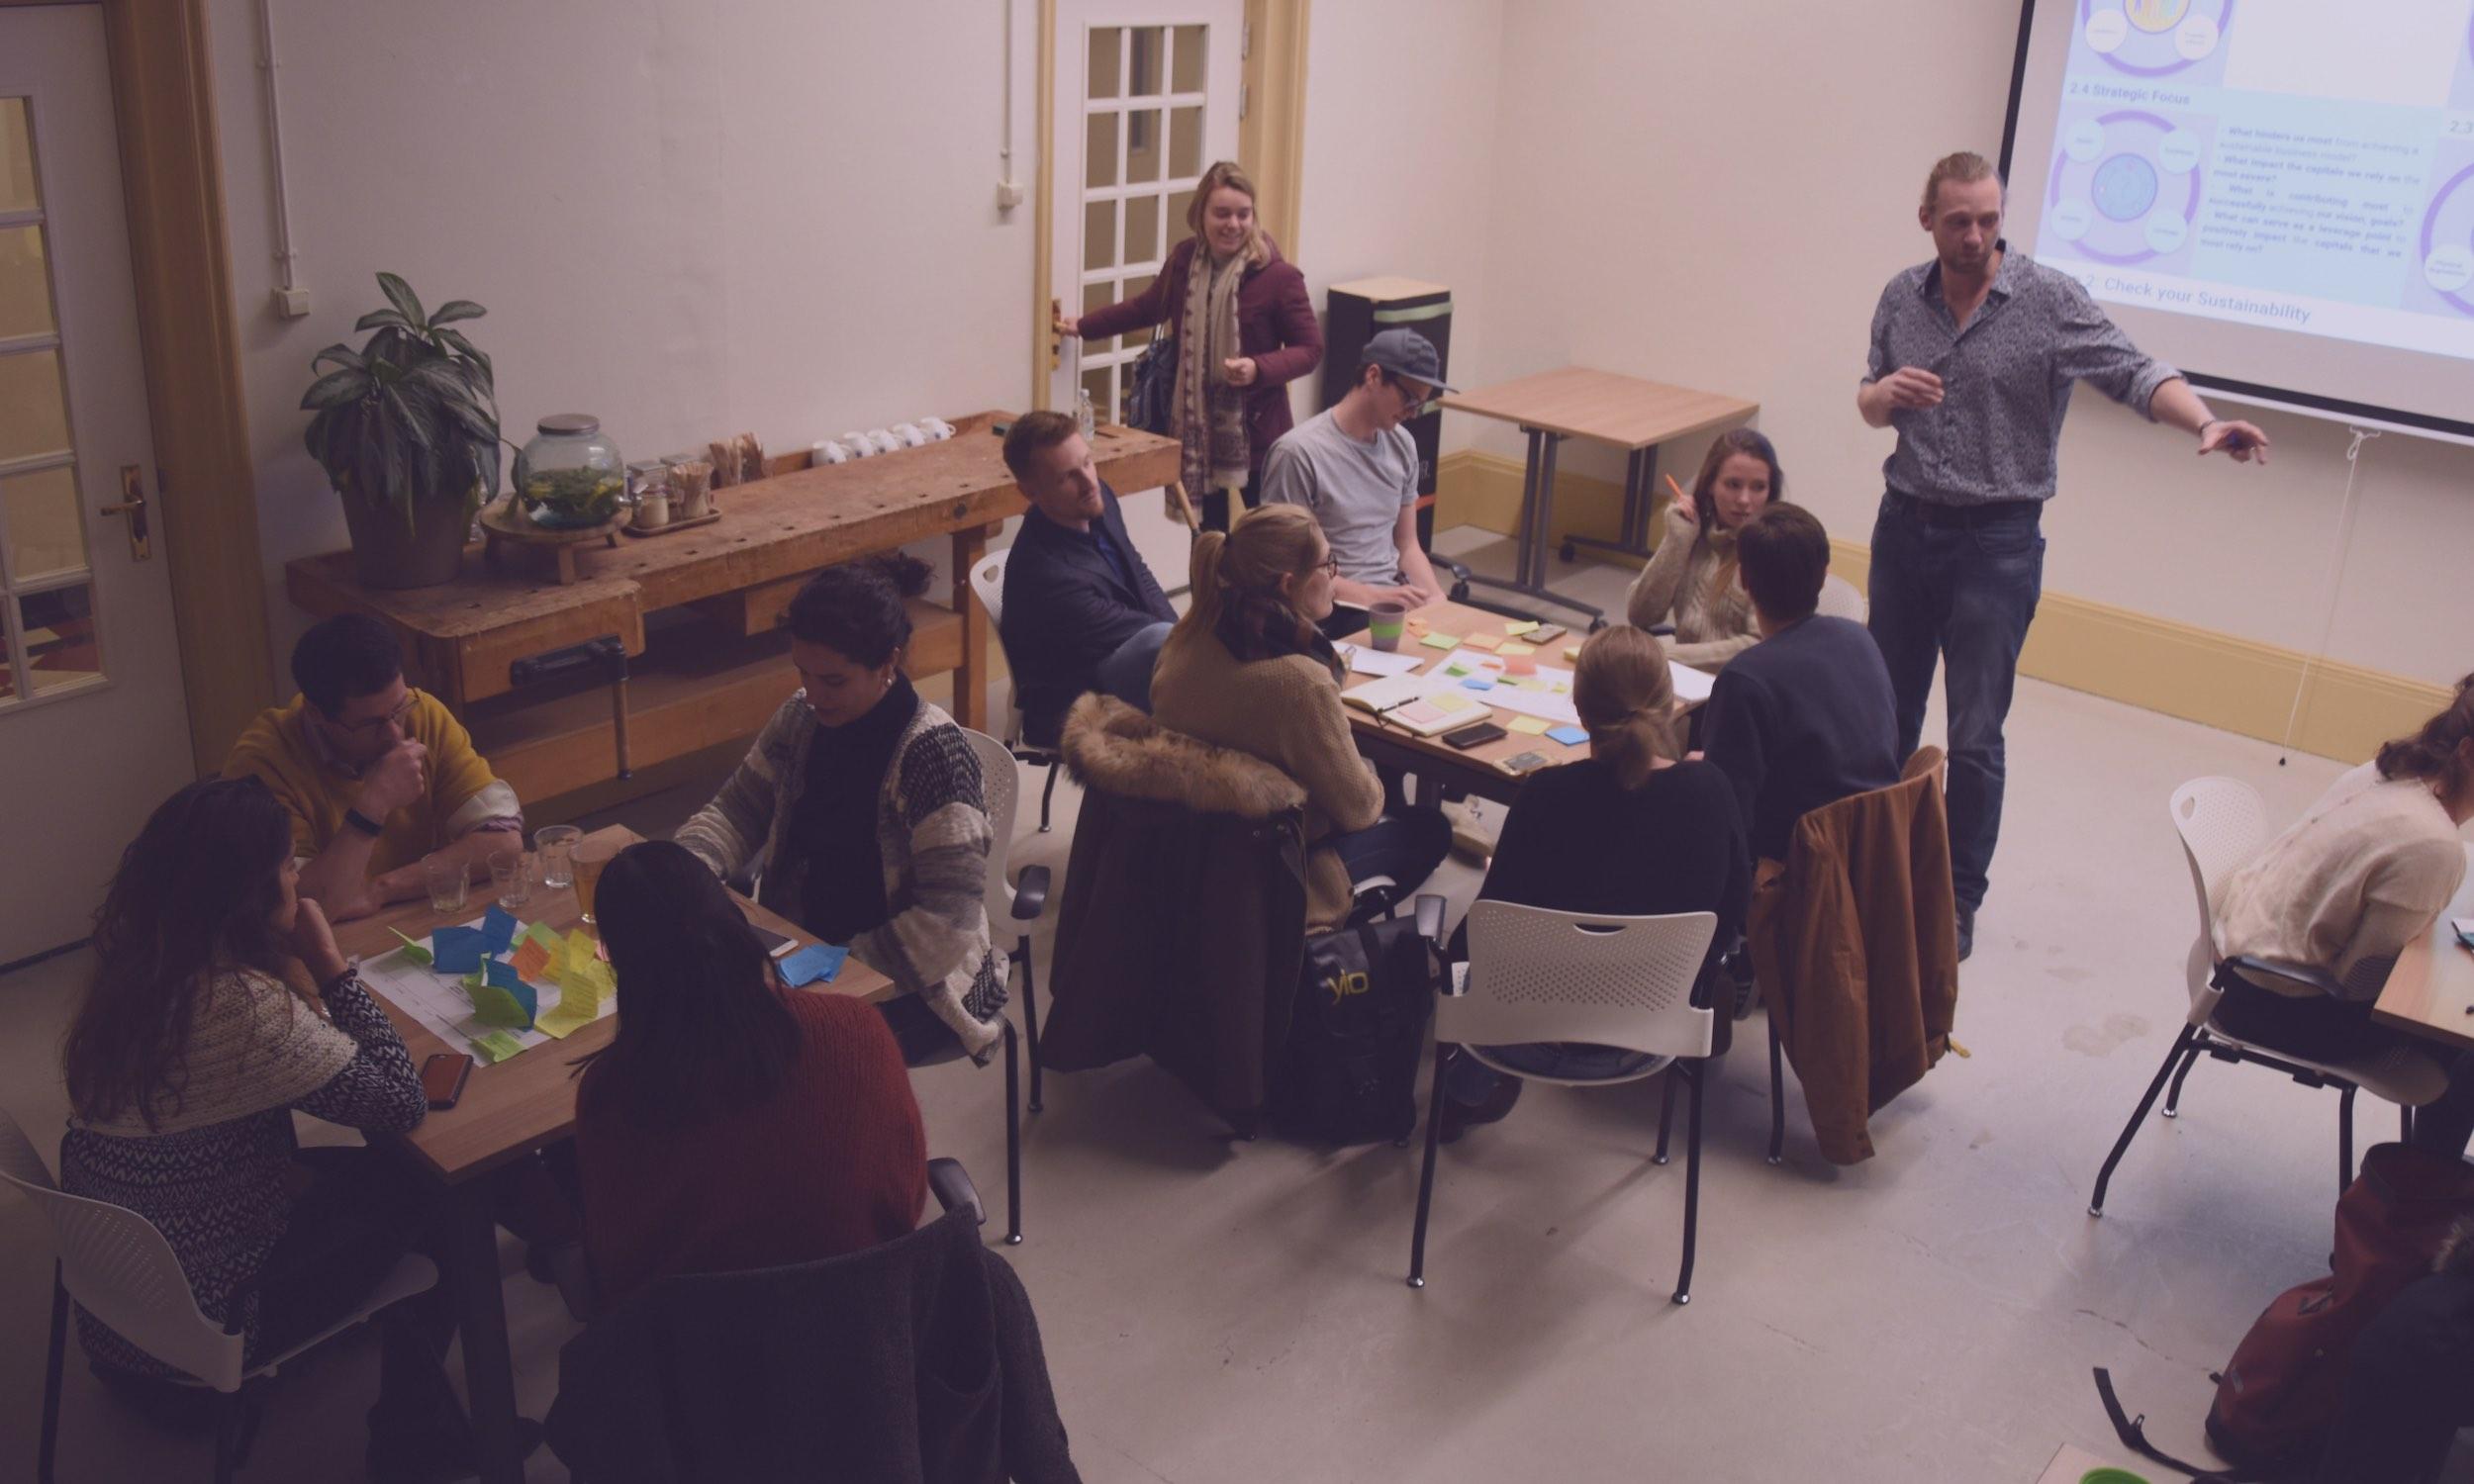 groupwork2 SBMC4S@IC1218 www.sustainablestart.net